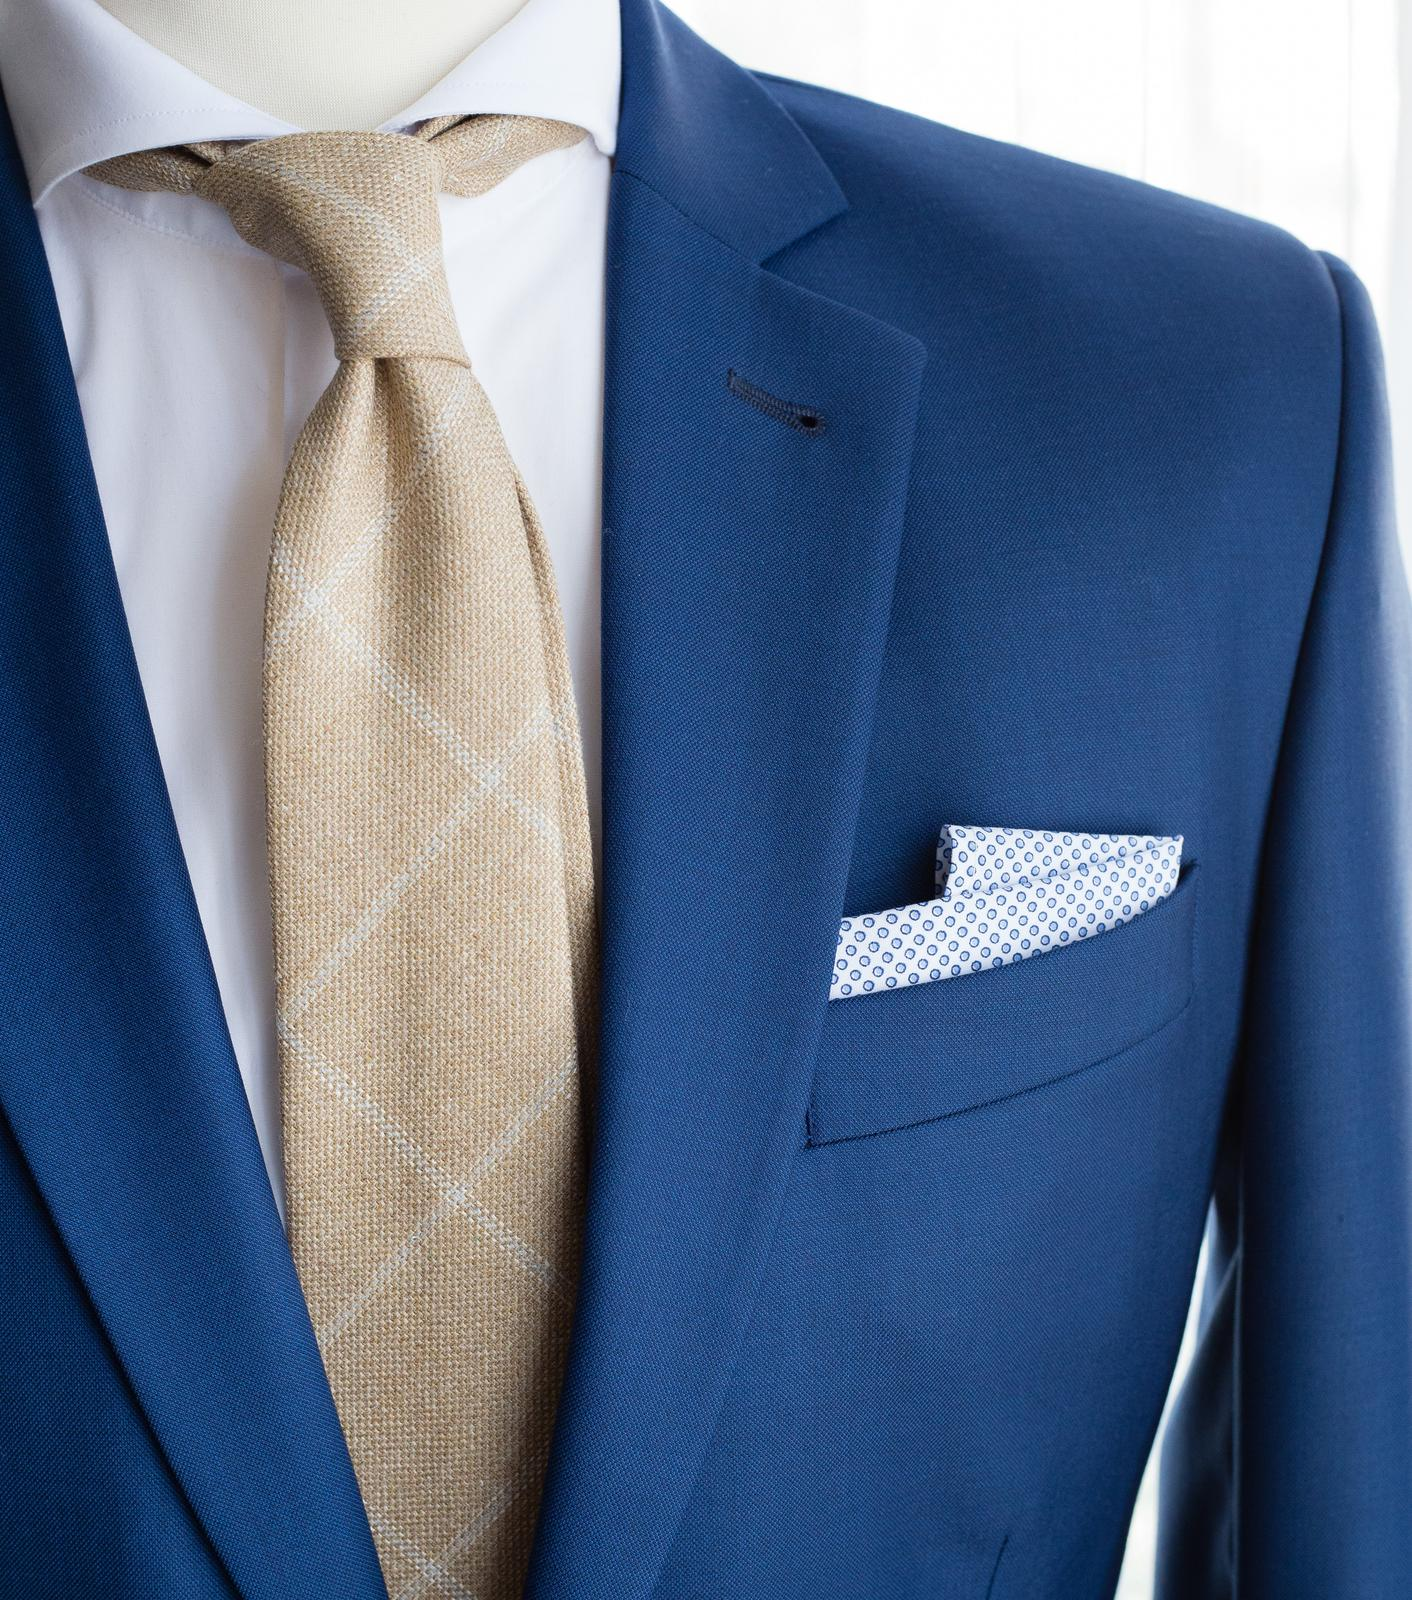 bubibubi_ties - Světle-béžová kravata windowpane